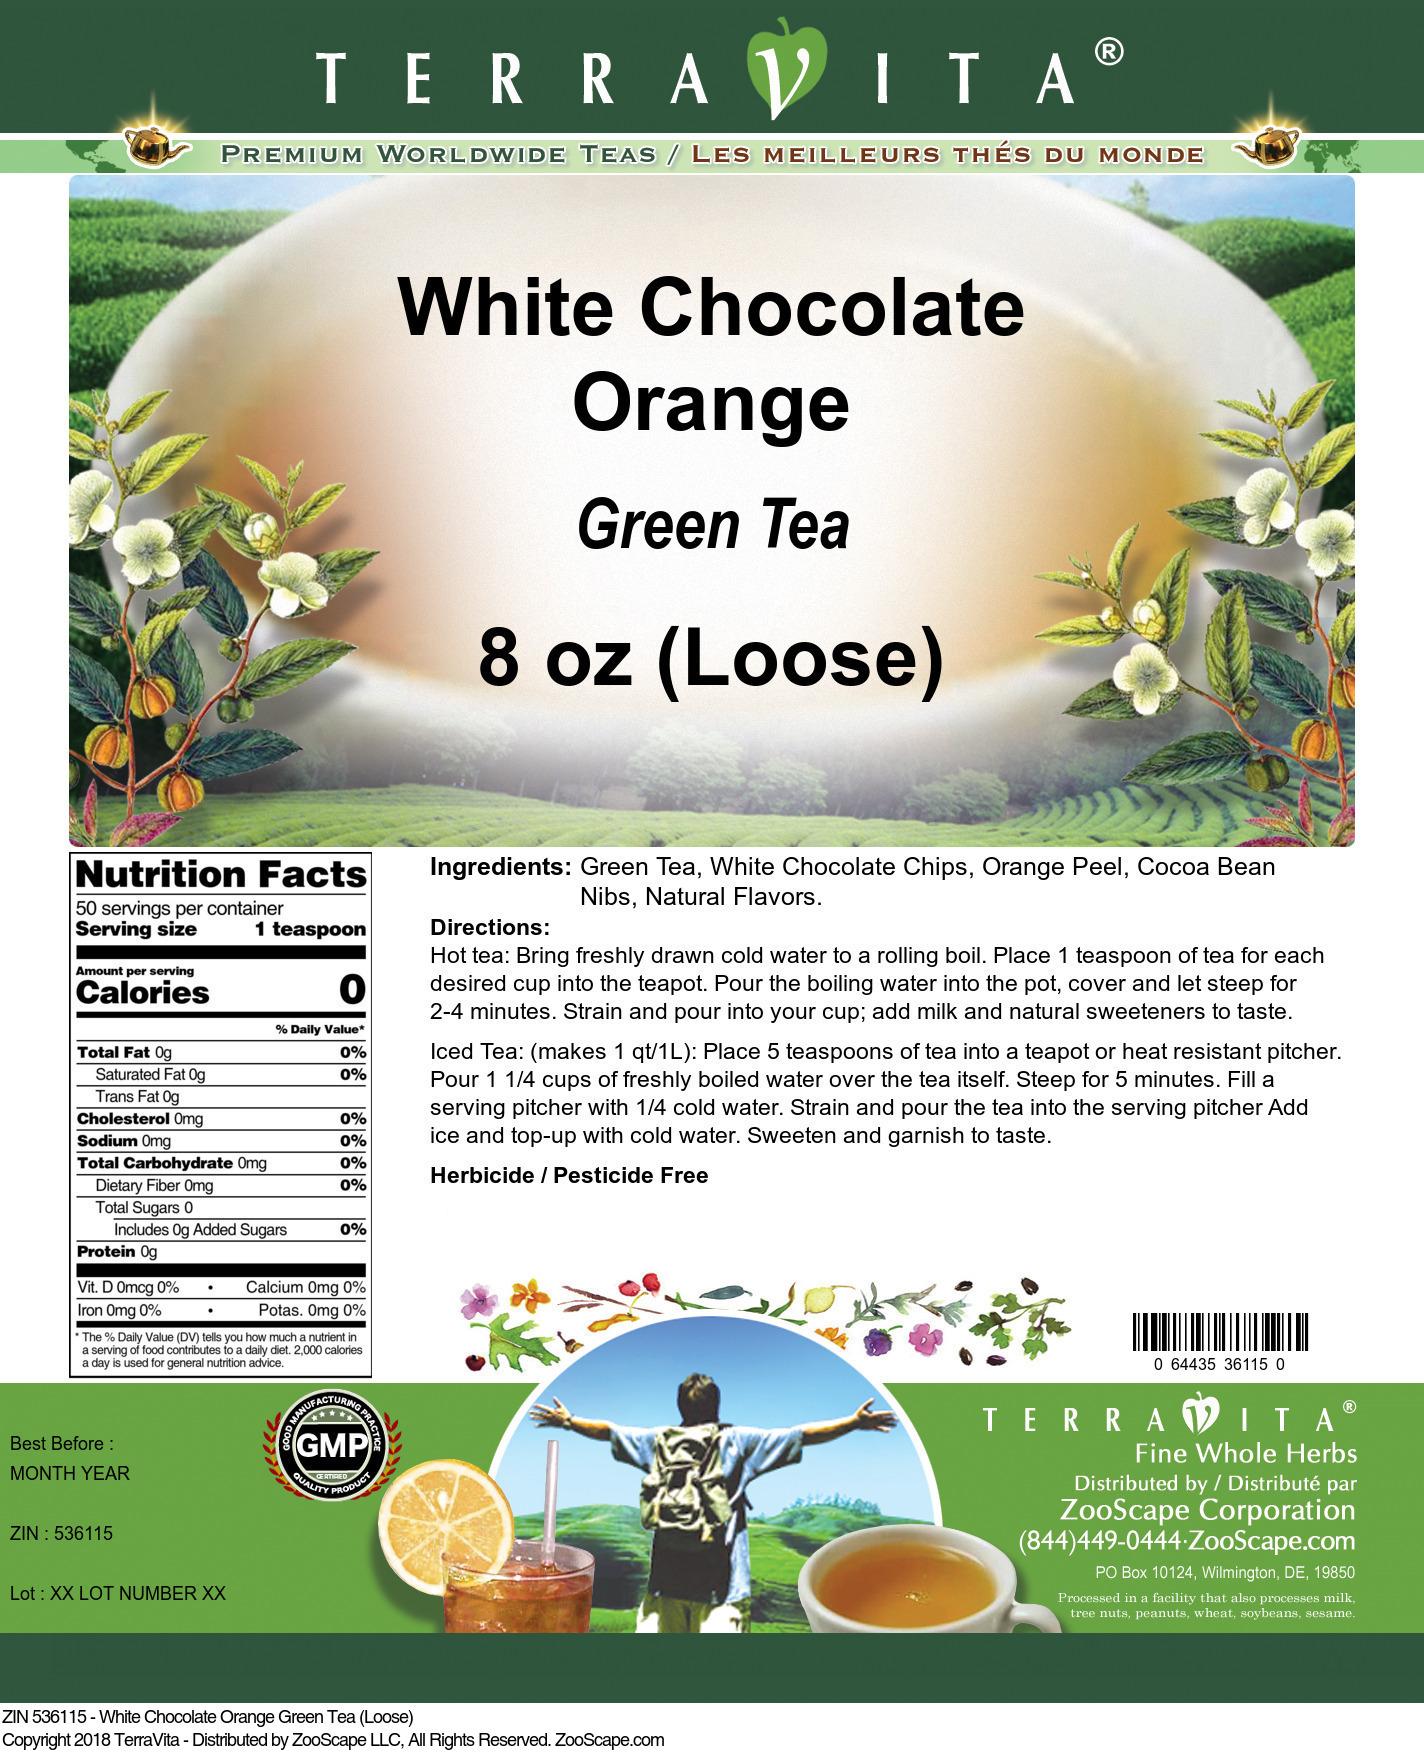 White Chocolate Orange Green Tea